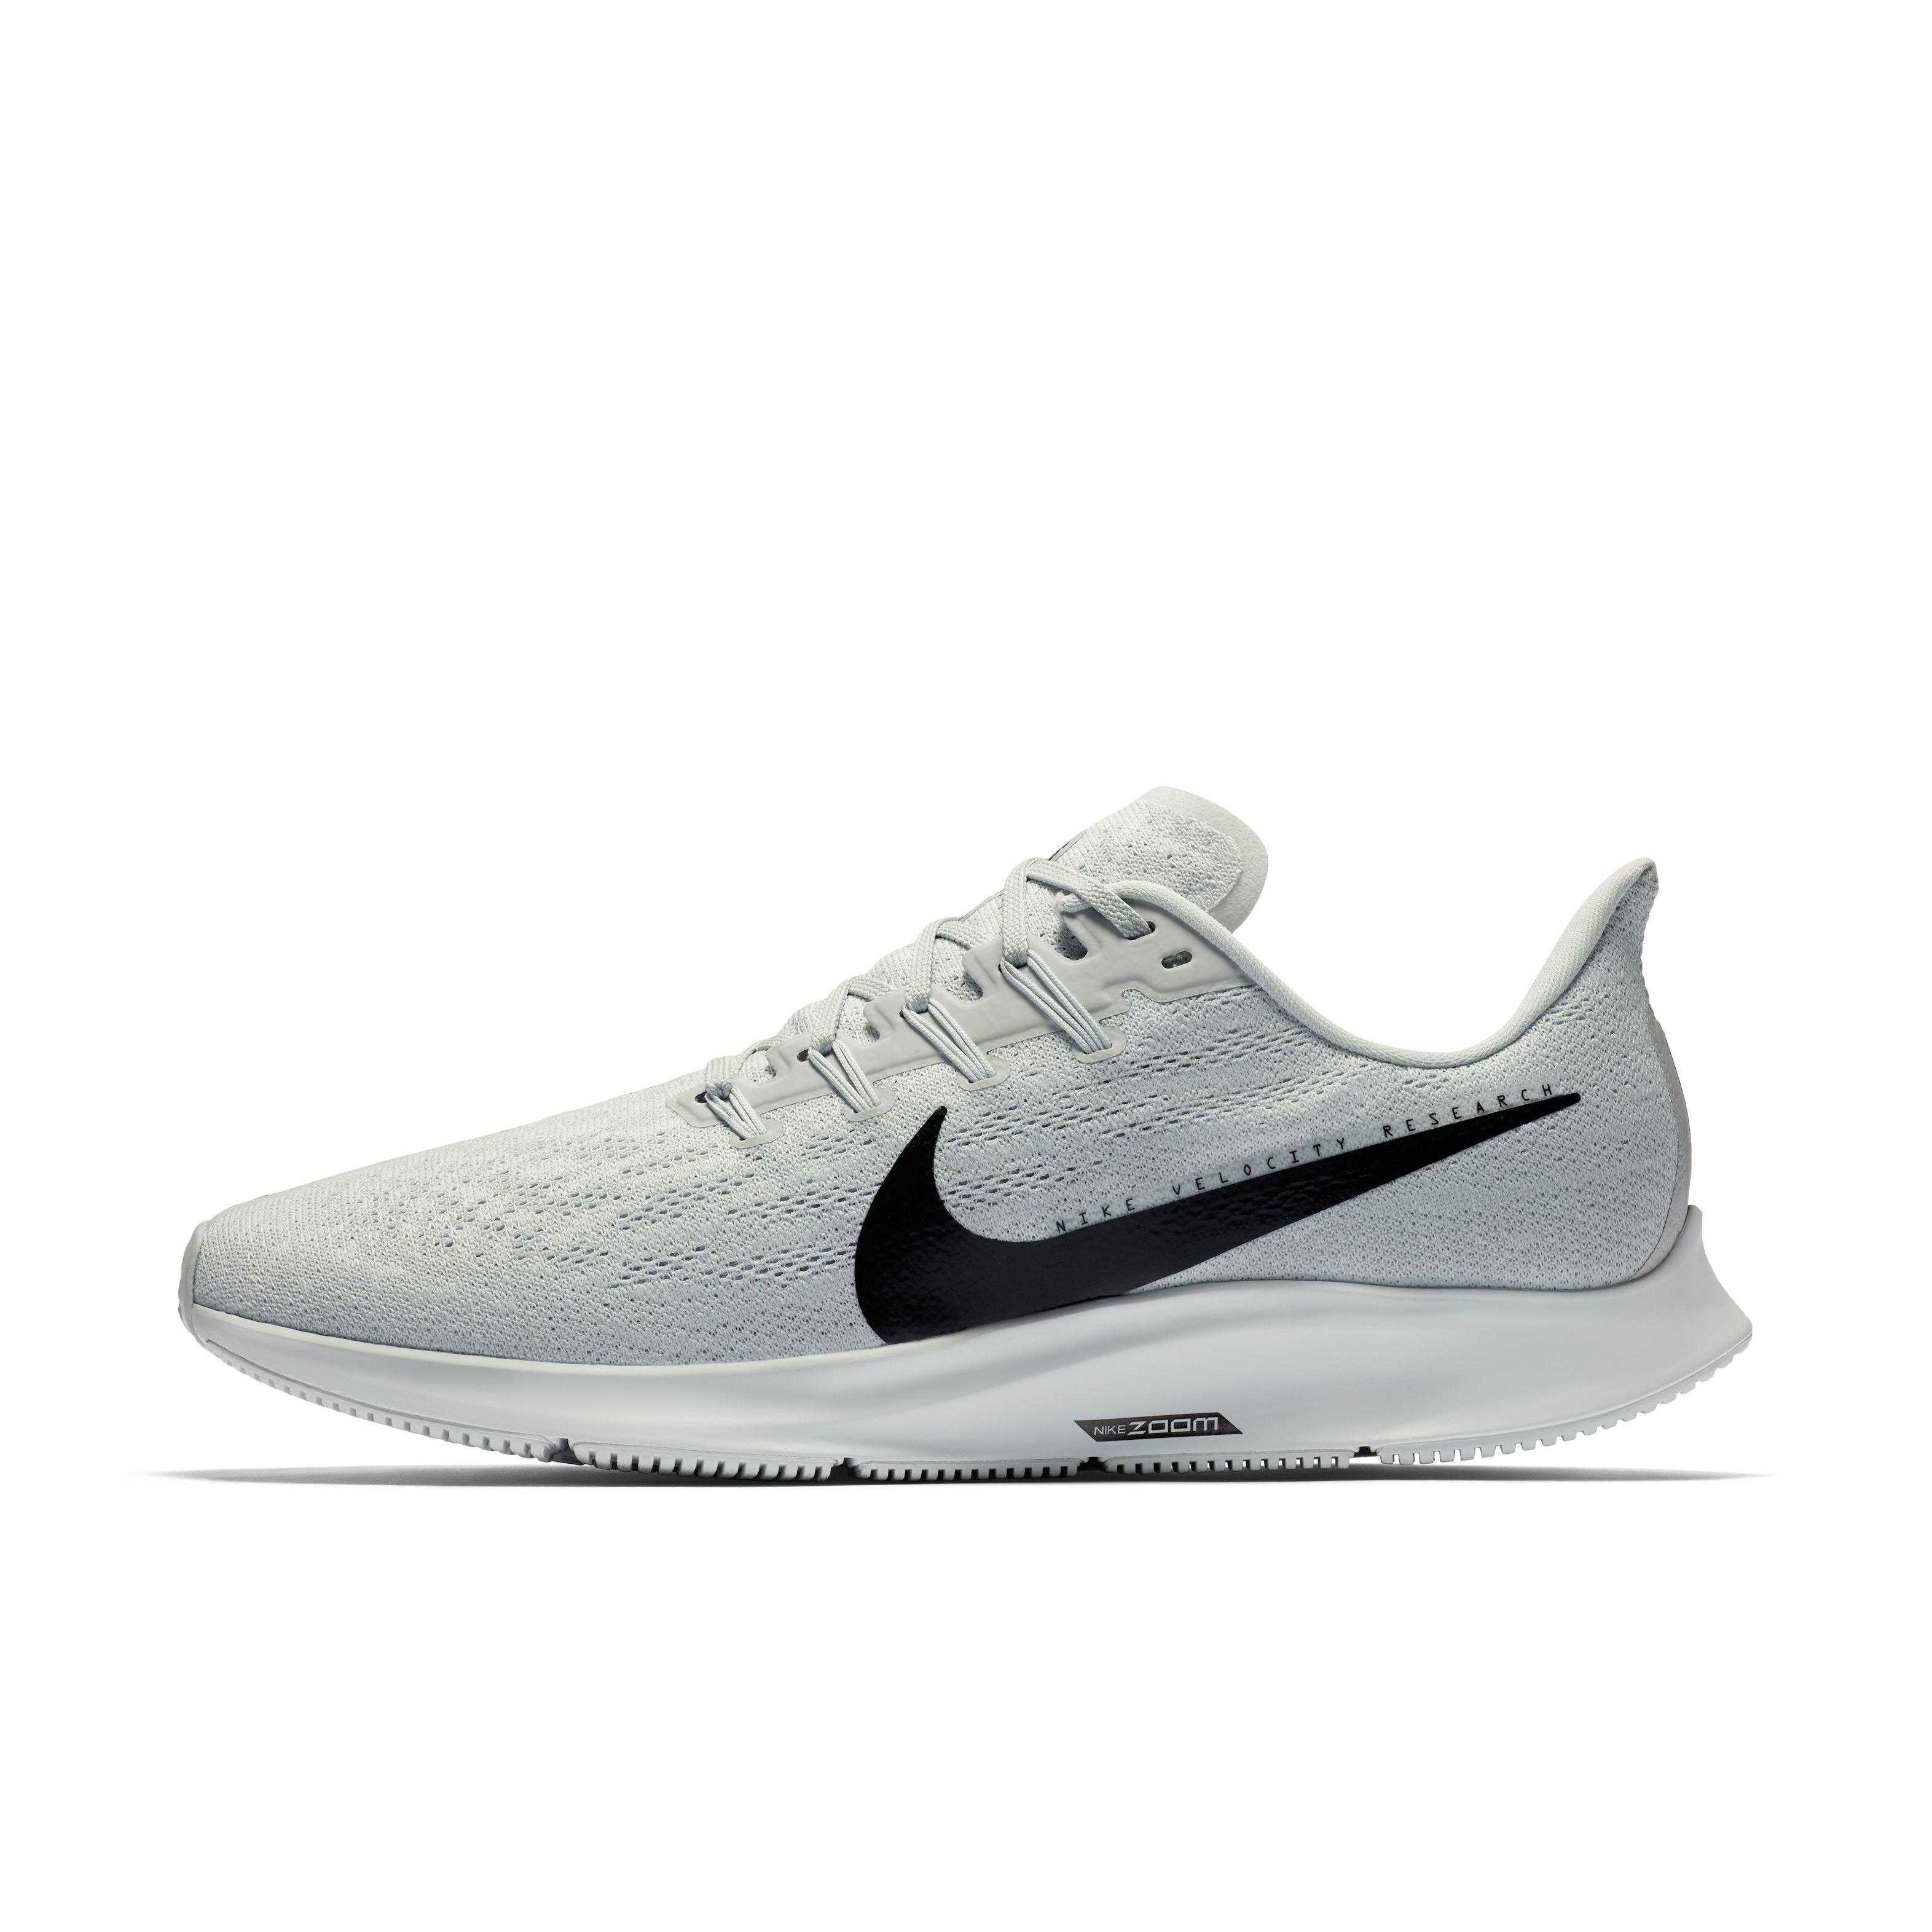 good cheap gym shoes